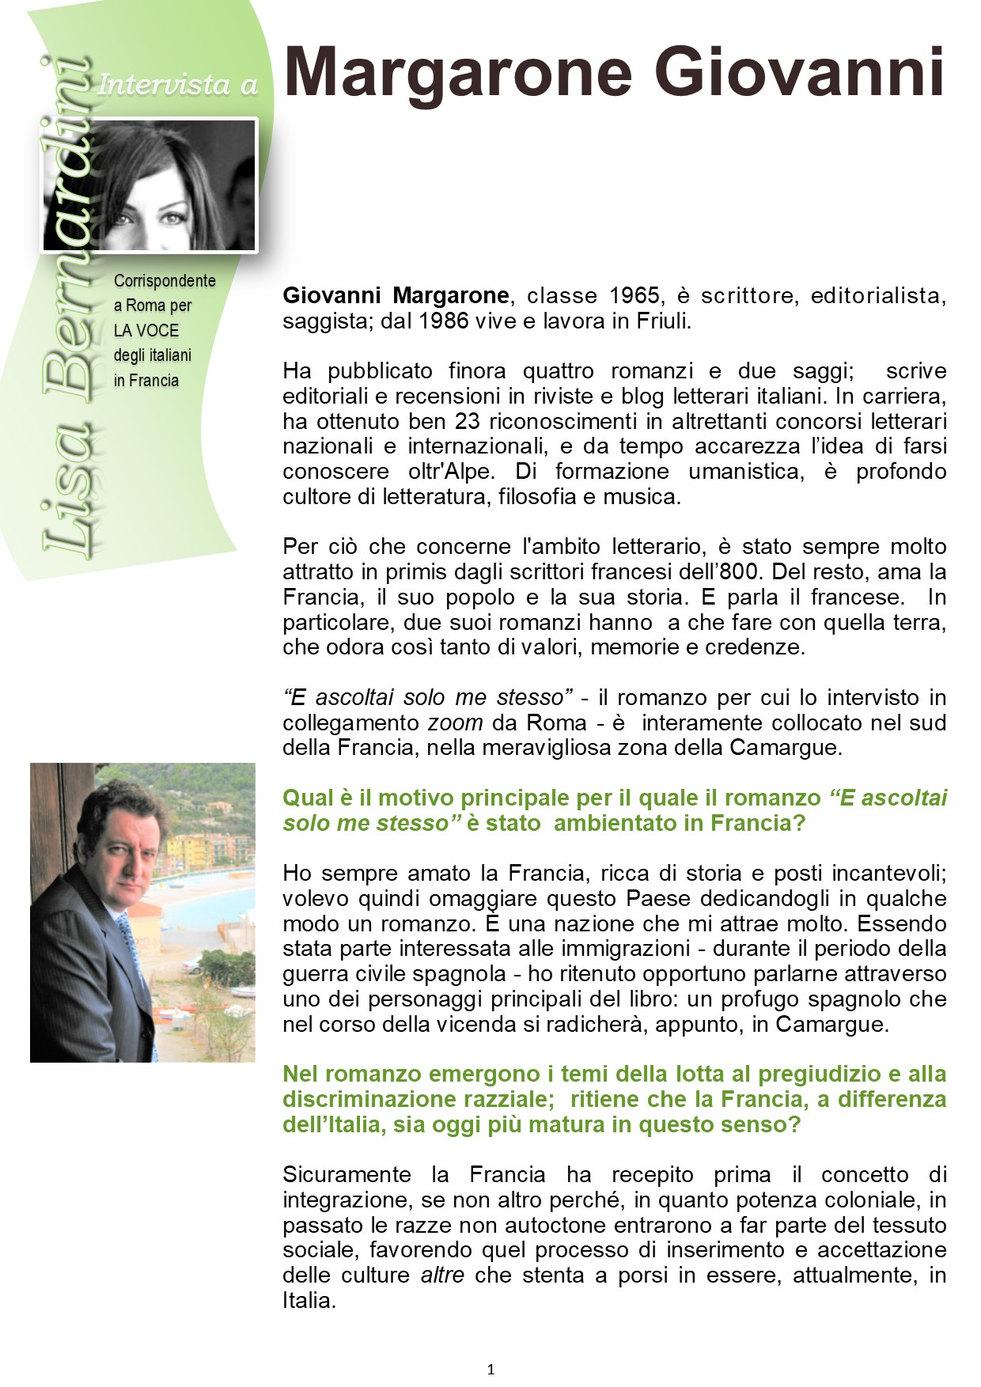 art MARGARONE 1 Giovanni  14052021.jpg